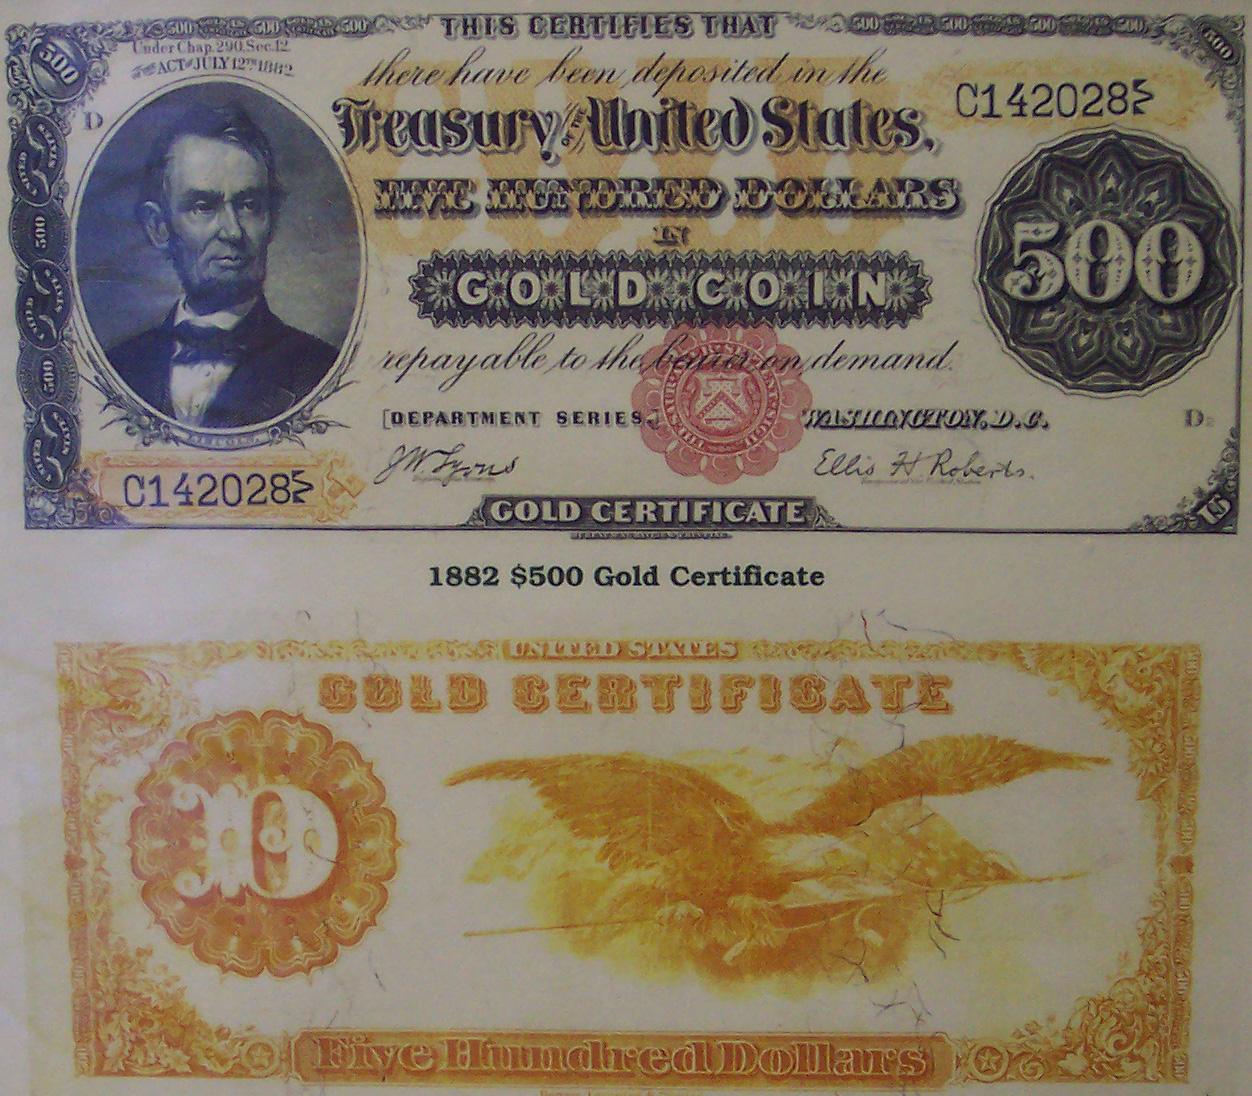 http://1.bp.blogspot.com/-wiIRutl3Cjc/TuTqwx7s6xI/AAAAAAAABNc/o_Dx8ydmmWE/s1600/Five_hundred_dollar_lincoln_bill.jpg